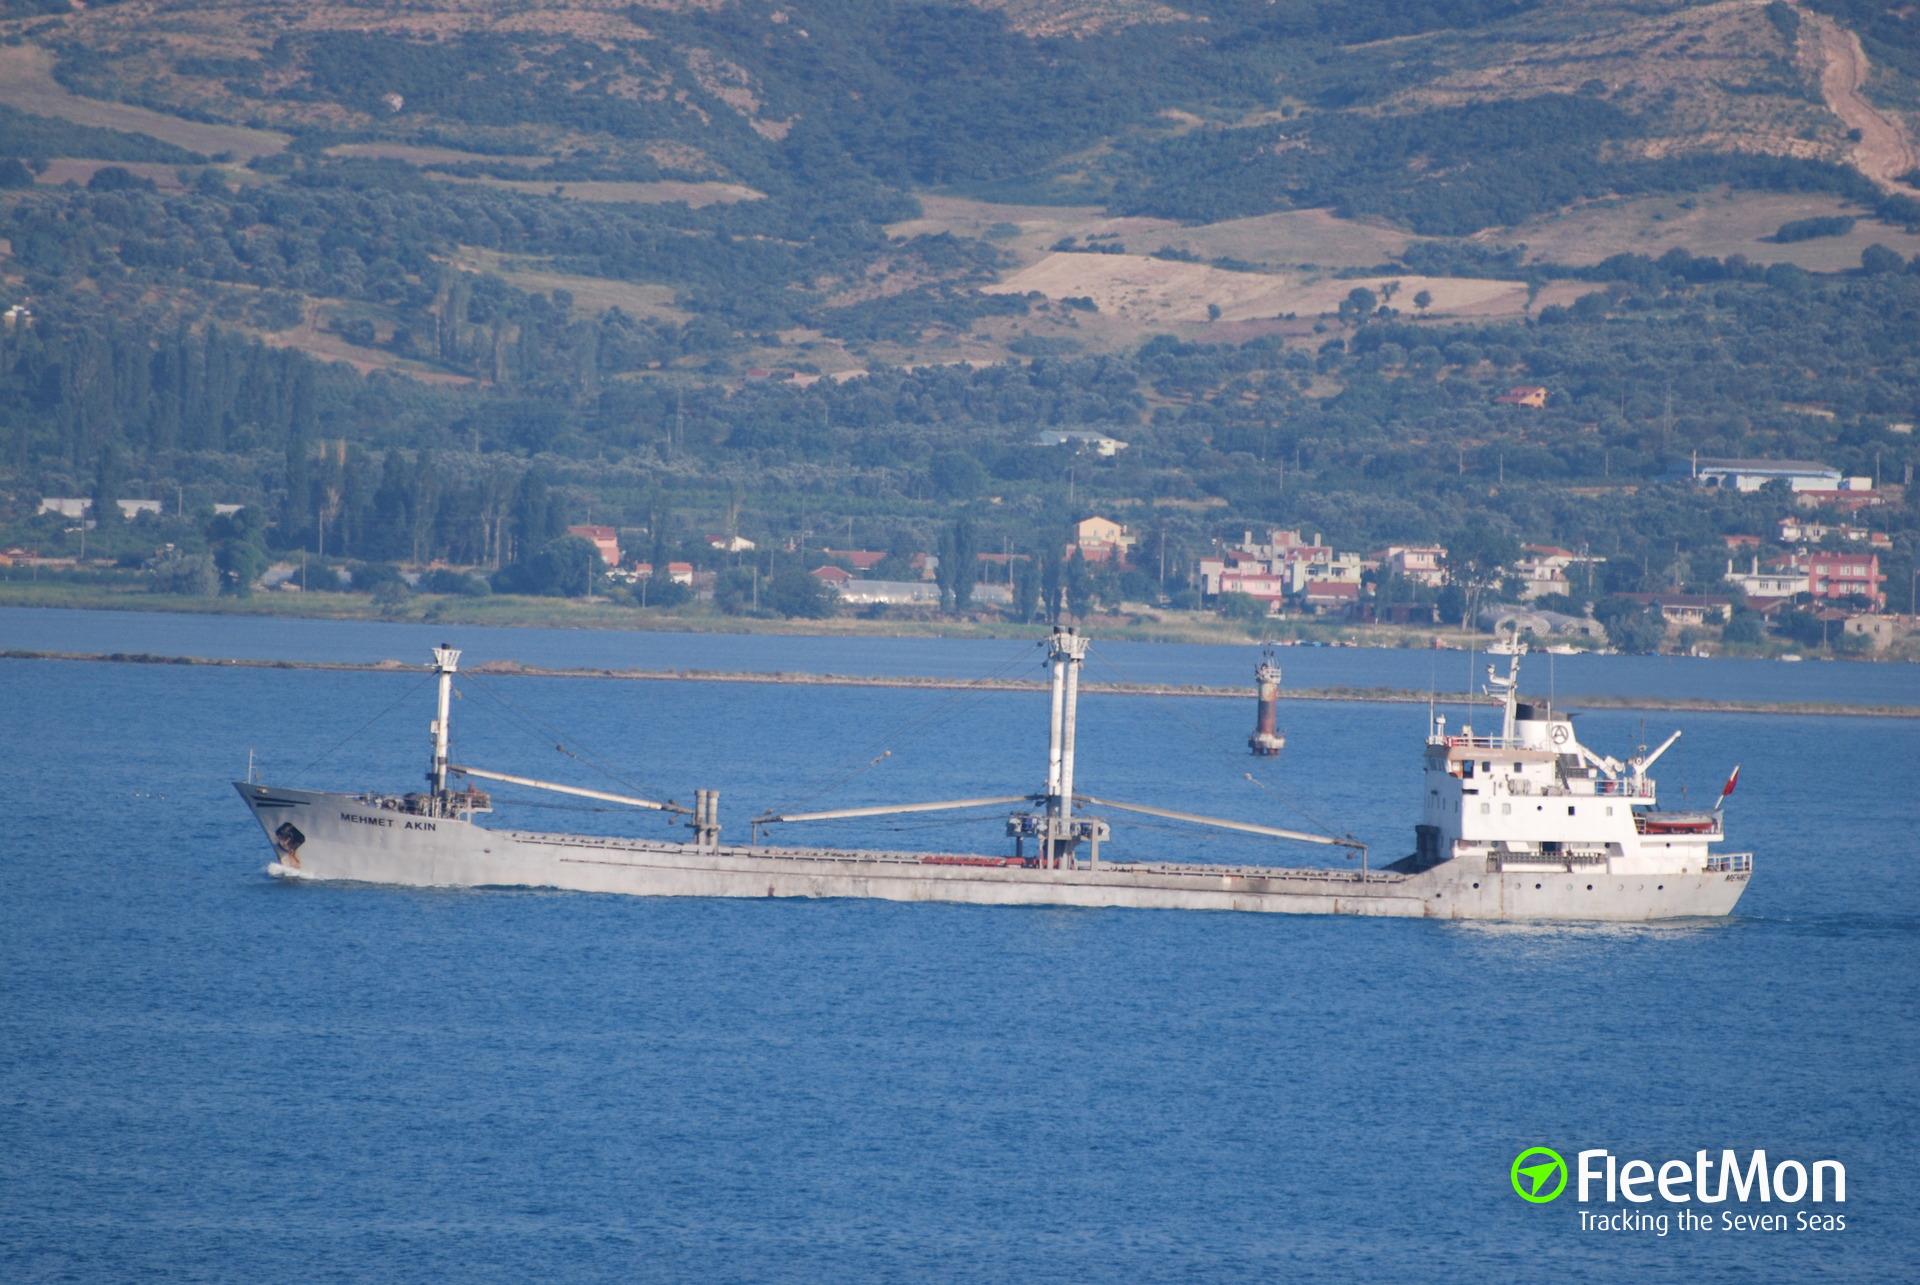 MEHMET AKIN breached in collision with pier, Turkey